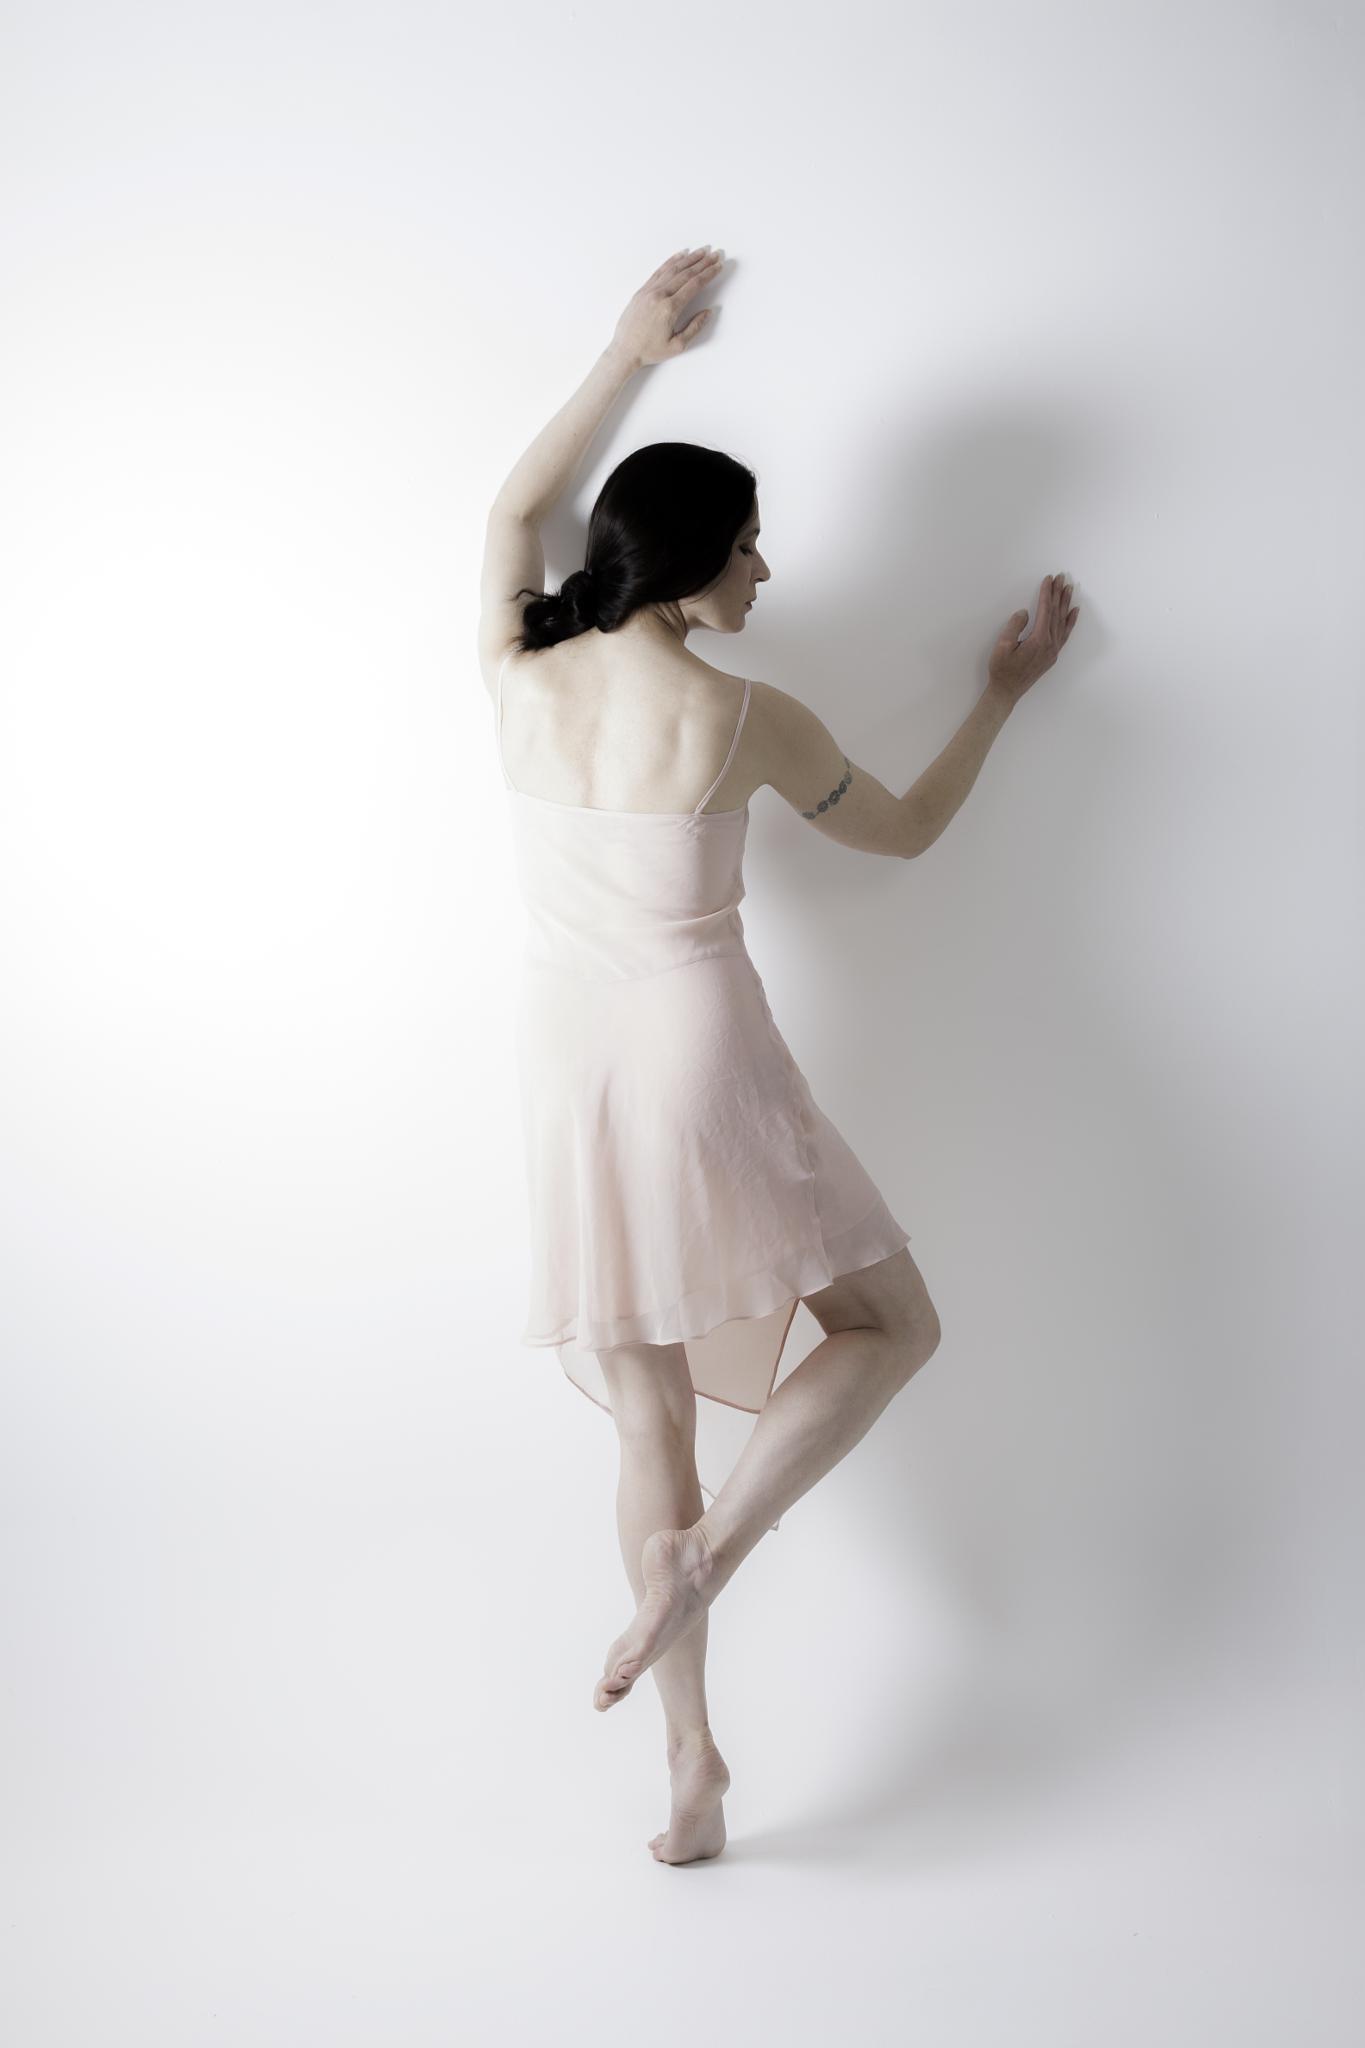 Dancer by morpheus1955